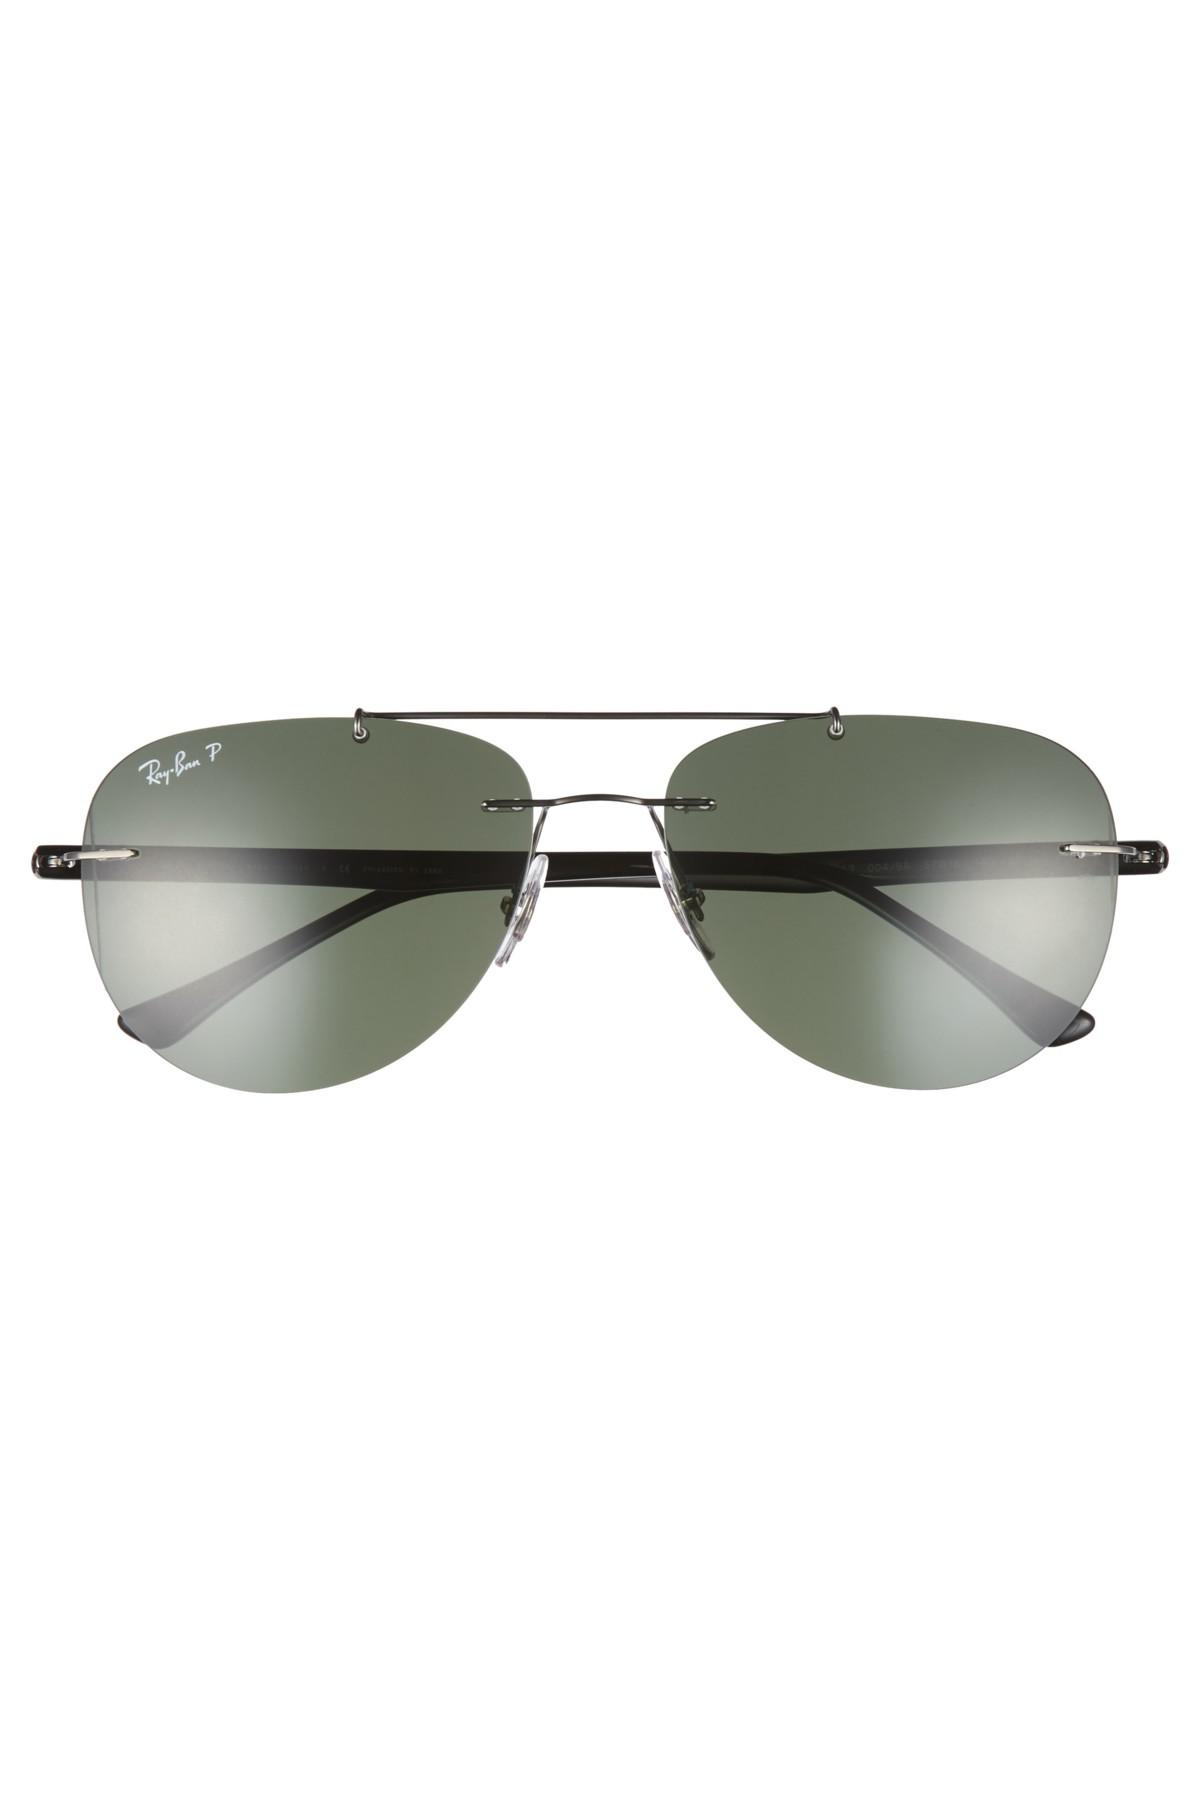 a82e6b3ed53 Lyst - Ray-Ban Phantos 57mm Polarized Rimless Aviator Sunglasses